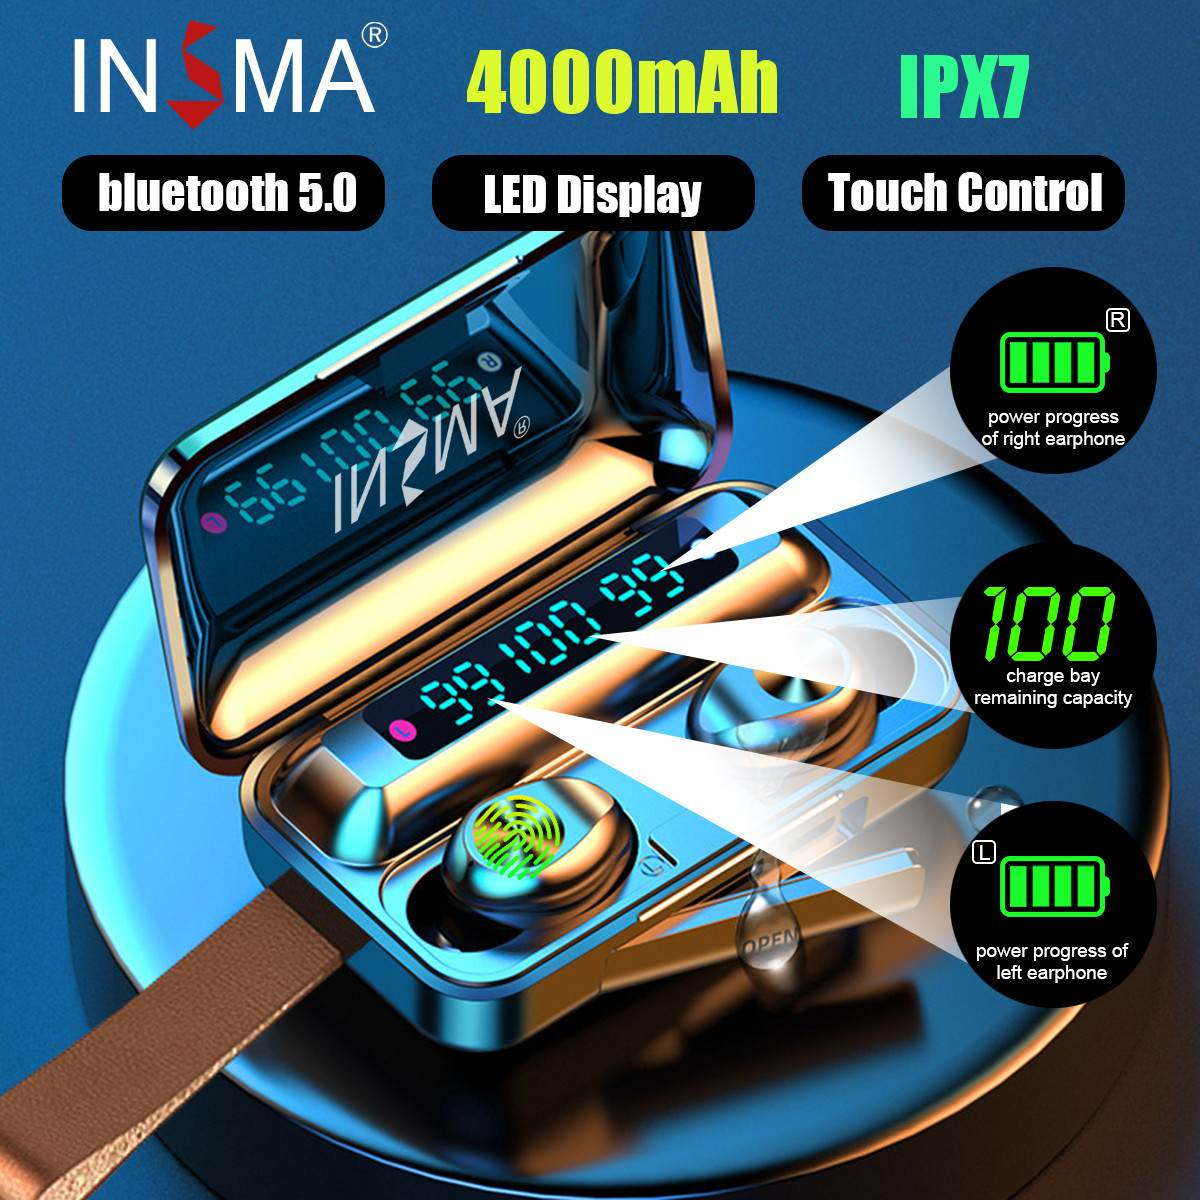 INSMA F9-10 3led 4000mAh Power Bank bluetooth 5 0 TWS Earphones Led Digital Display Wireless Stereo Sport Waterproof Earbuds